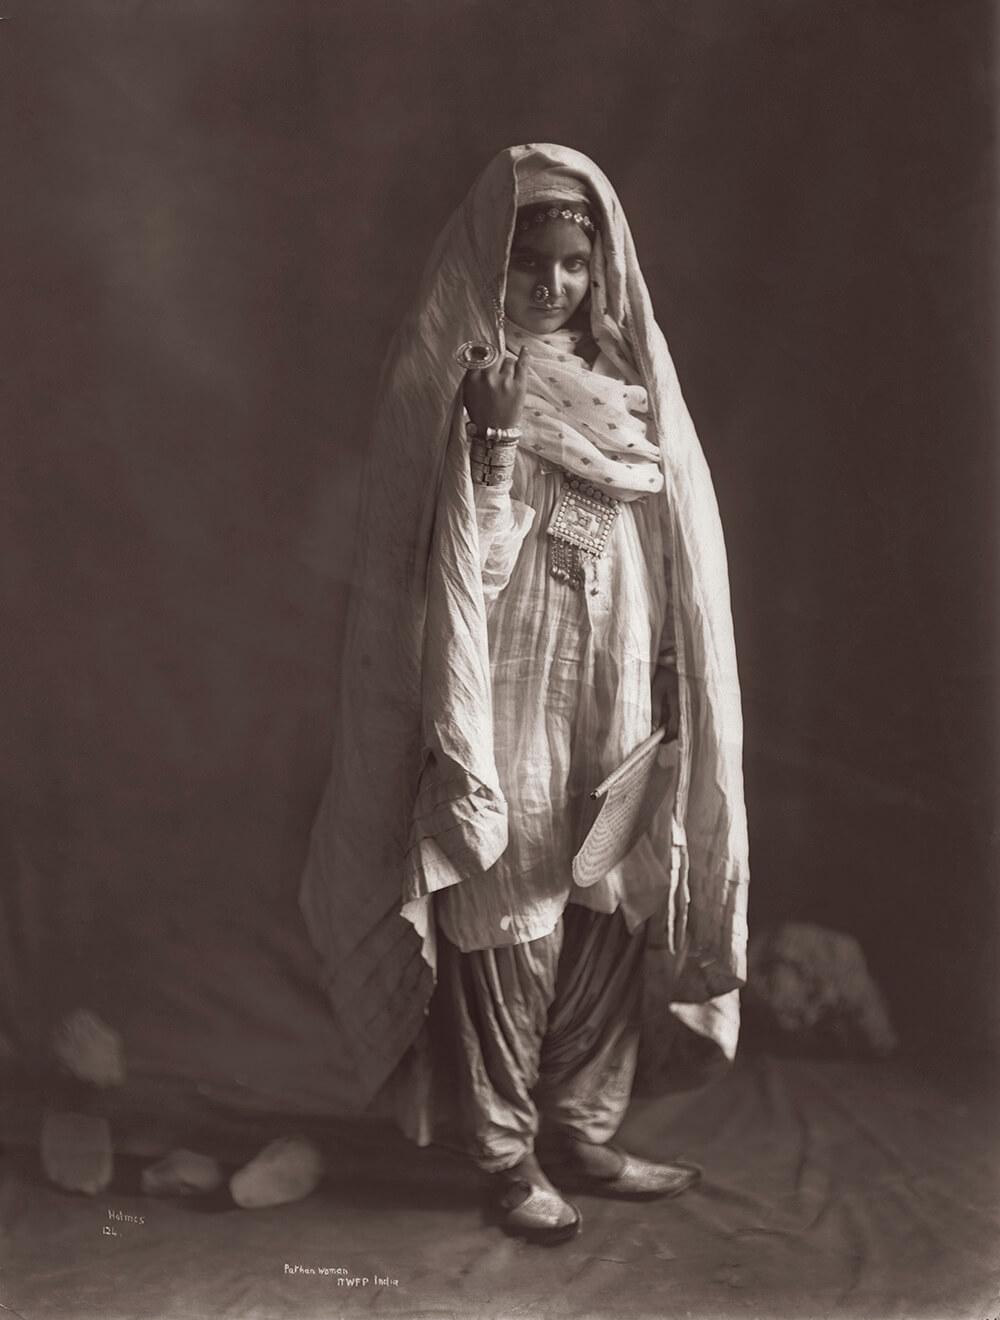 Pathan Woman fine art photography